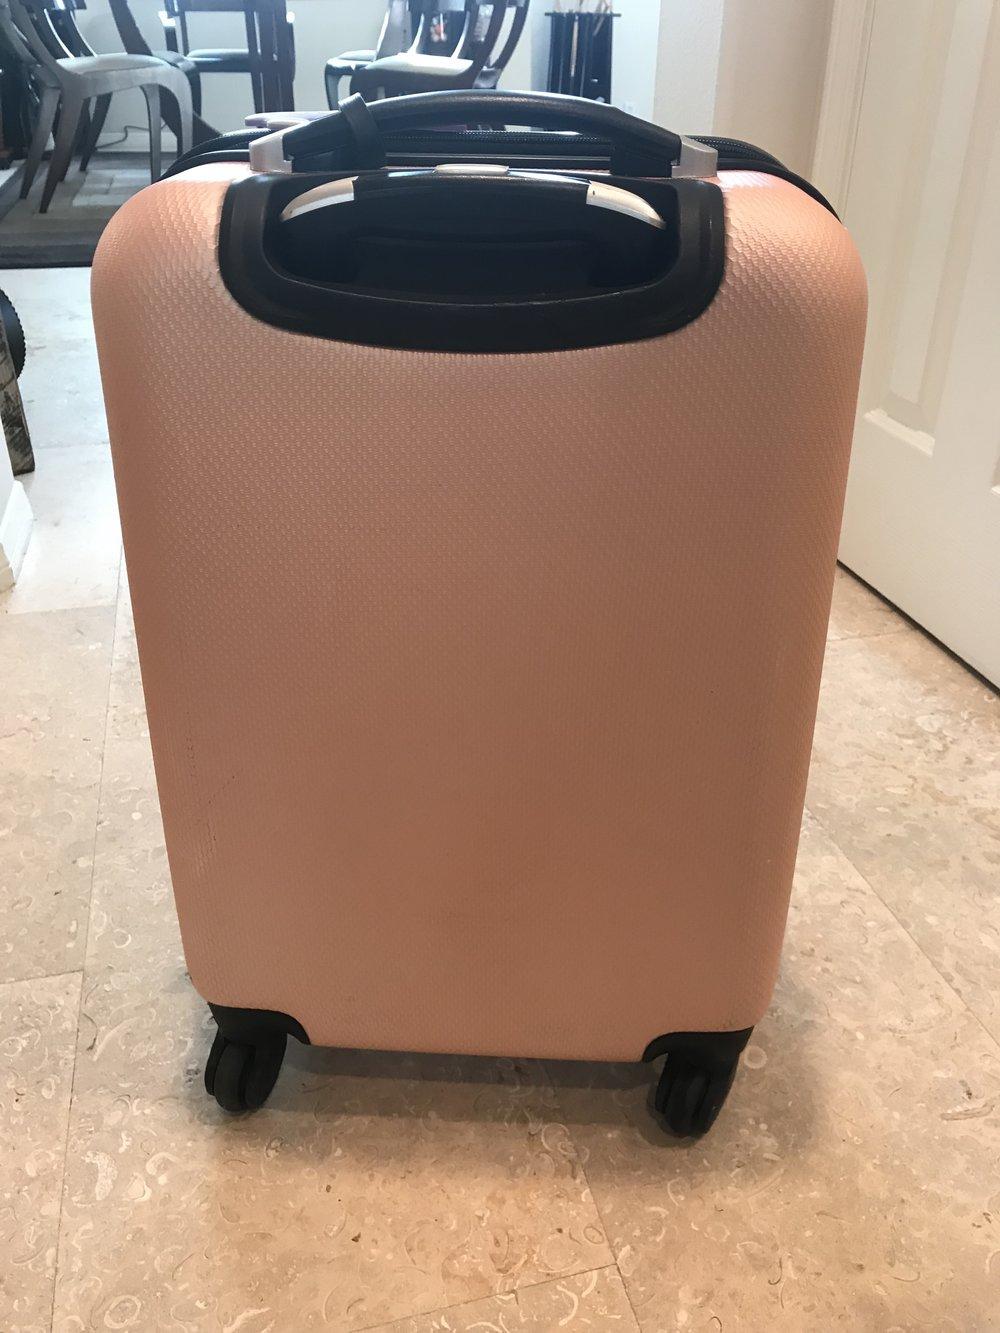 Luggage After - Magic Eraser!